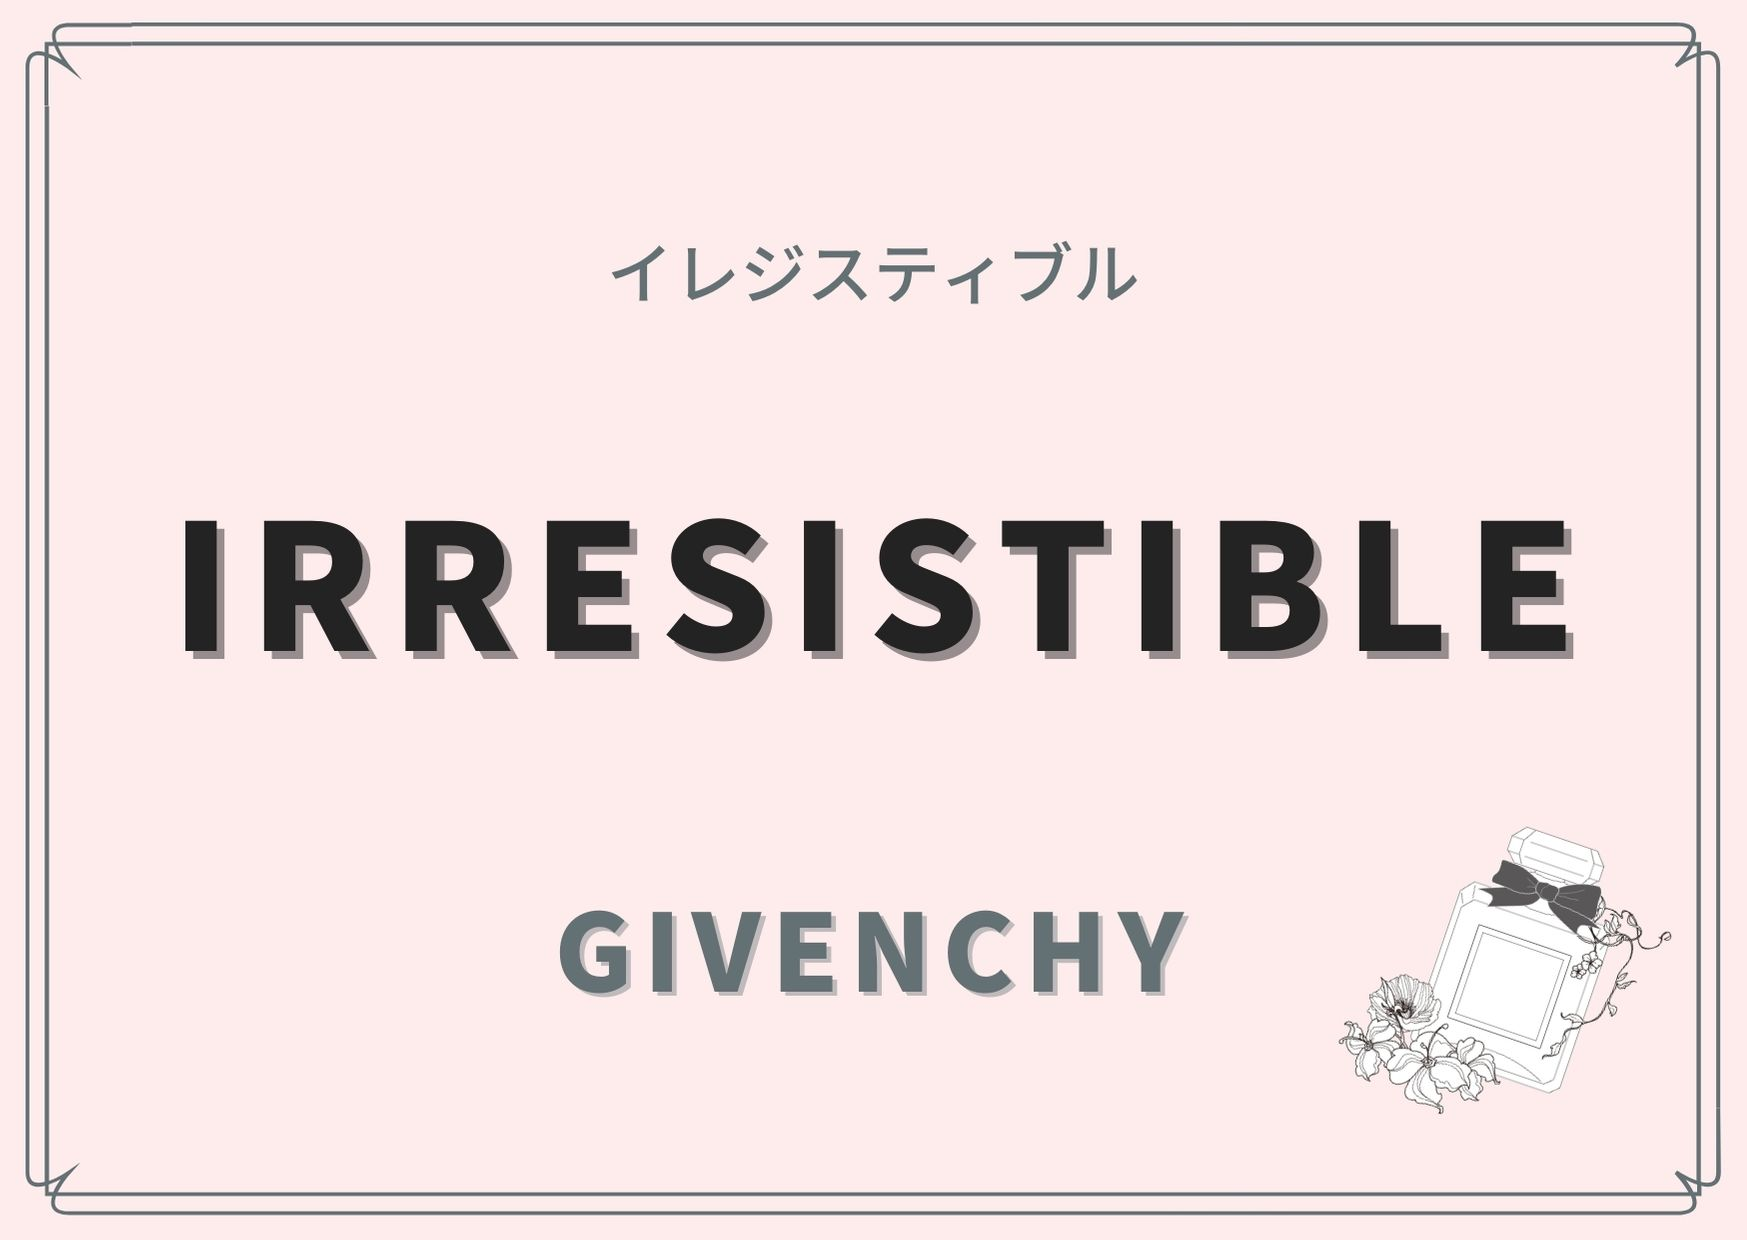 IRRESISTIBLE(イレジスティブル)/GIVENCHY(ジバンシィ)